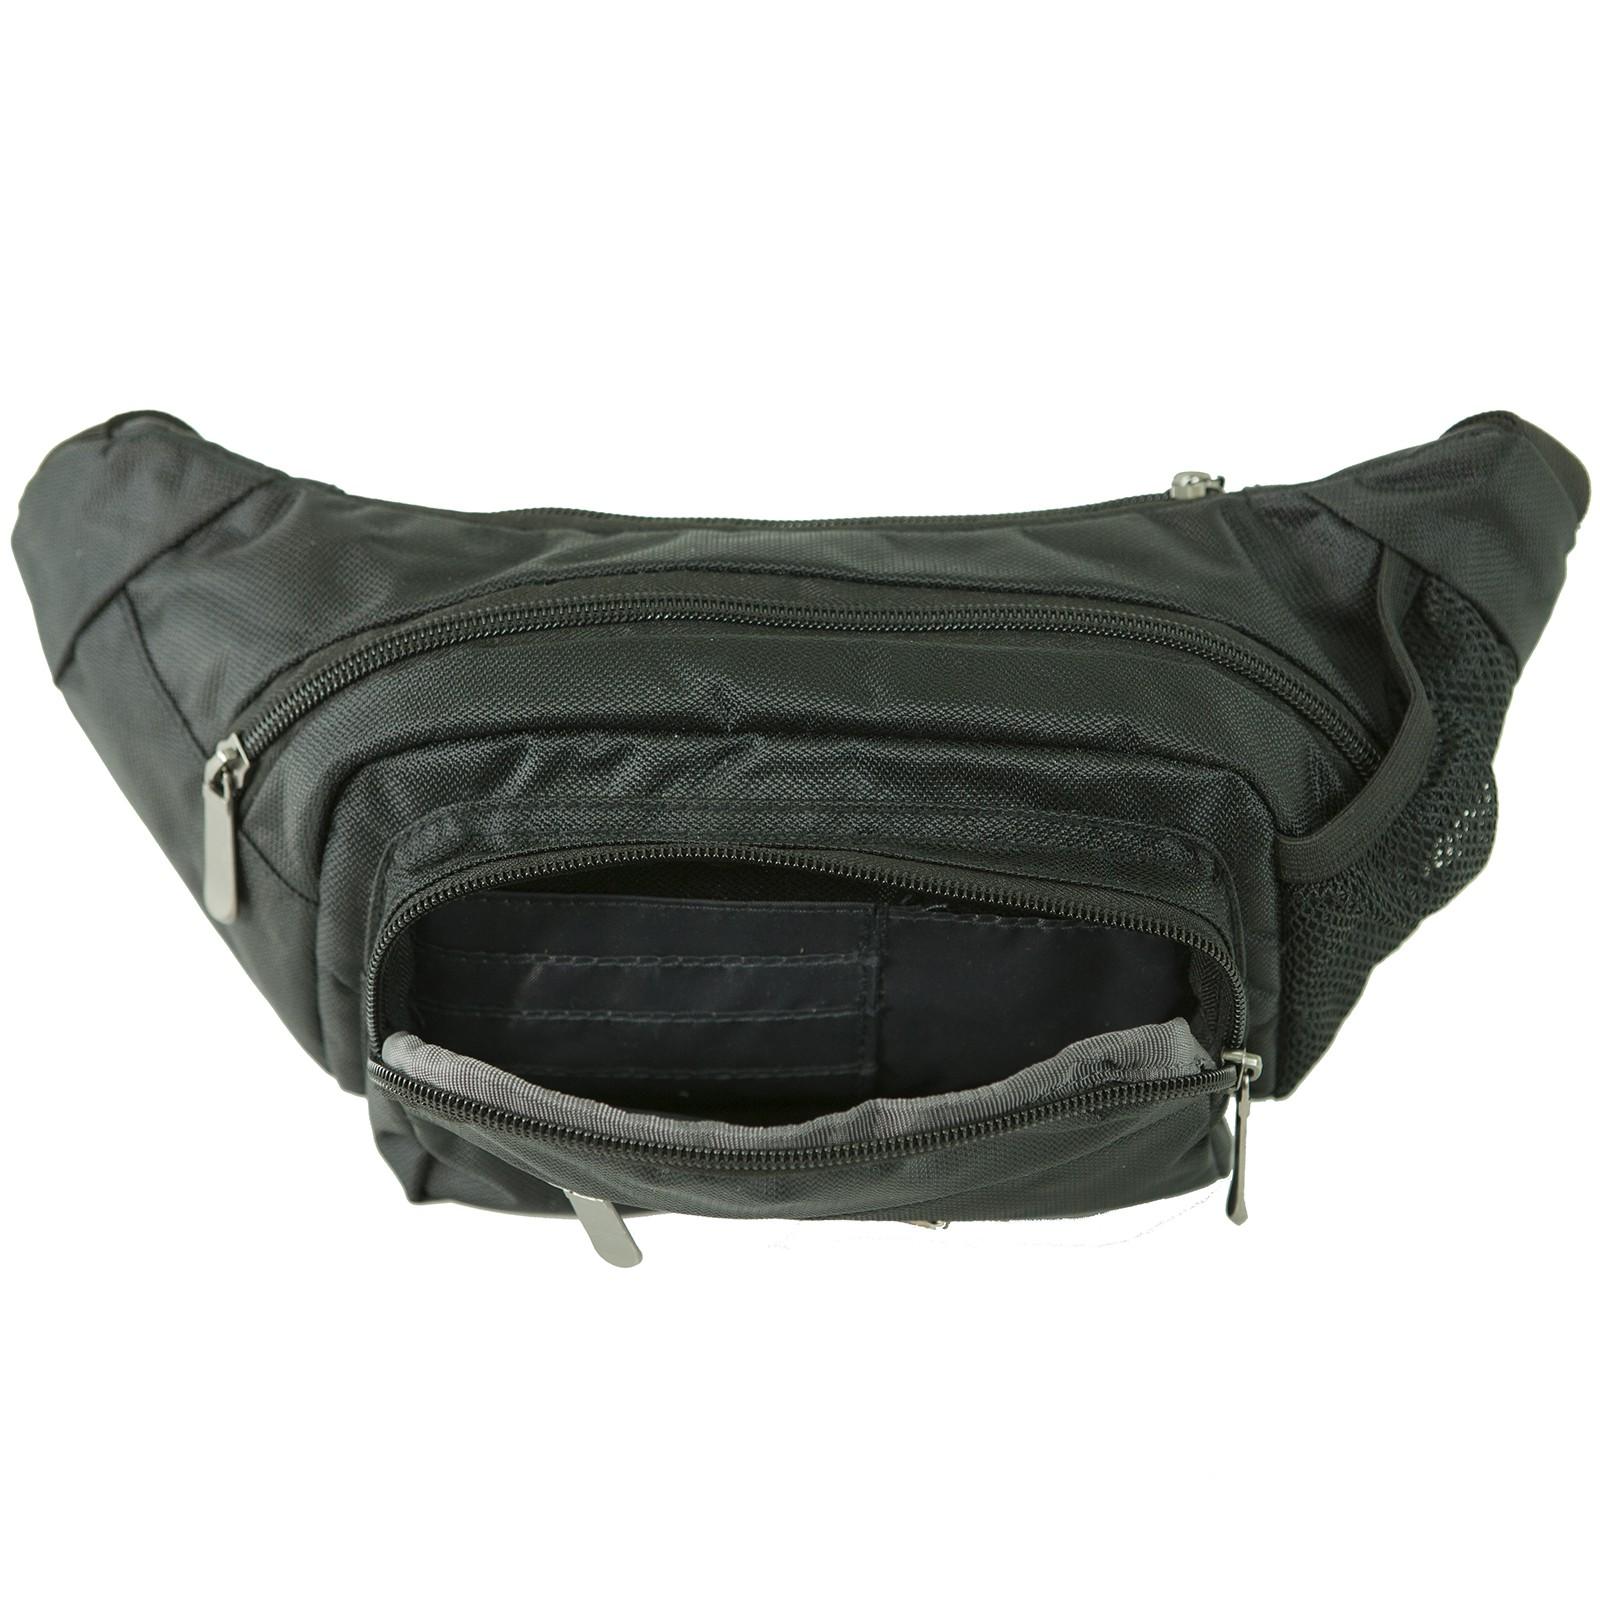 Alpine Swiss Fanny Pack Secure Travel Case Adjustable Belt Sport Pouch Waist Bag Ebay